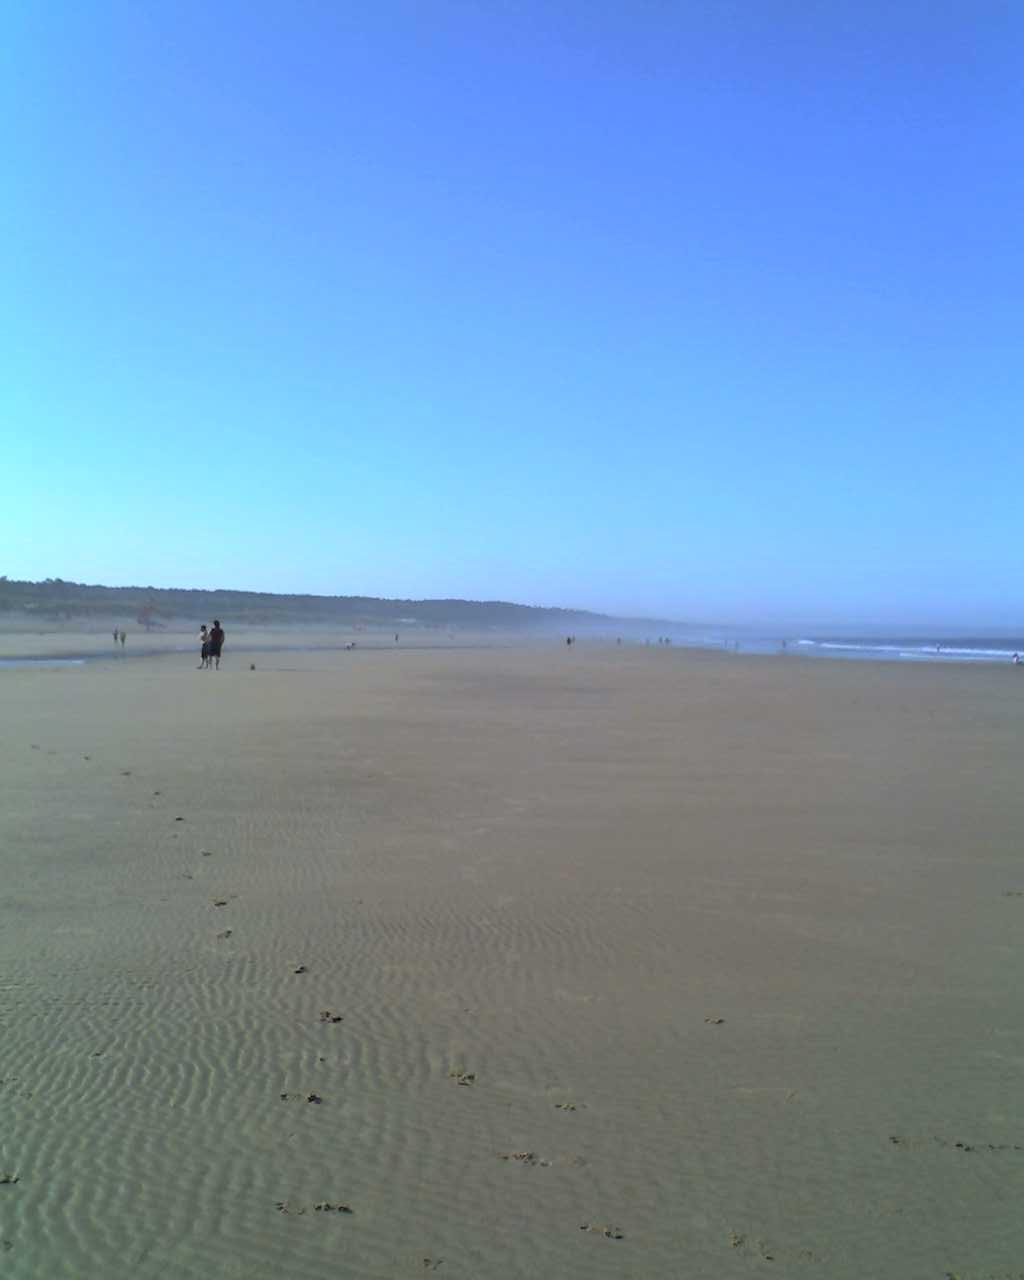 zona costeira, da costa da caparica, peninsula de setubal, portugal